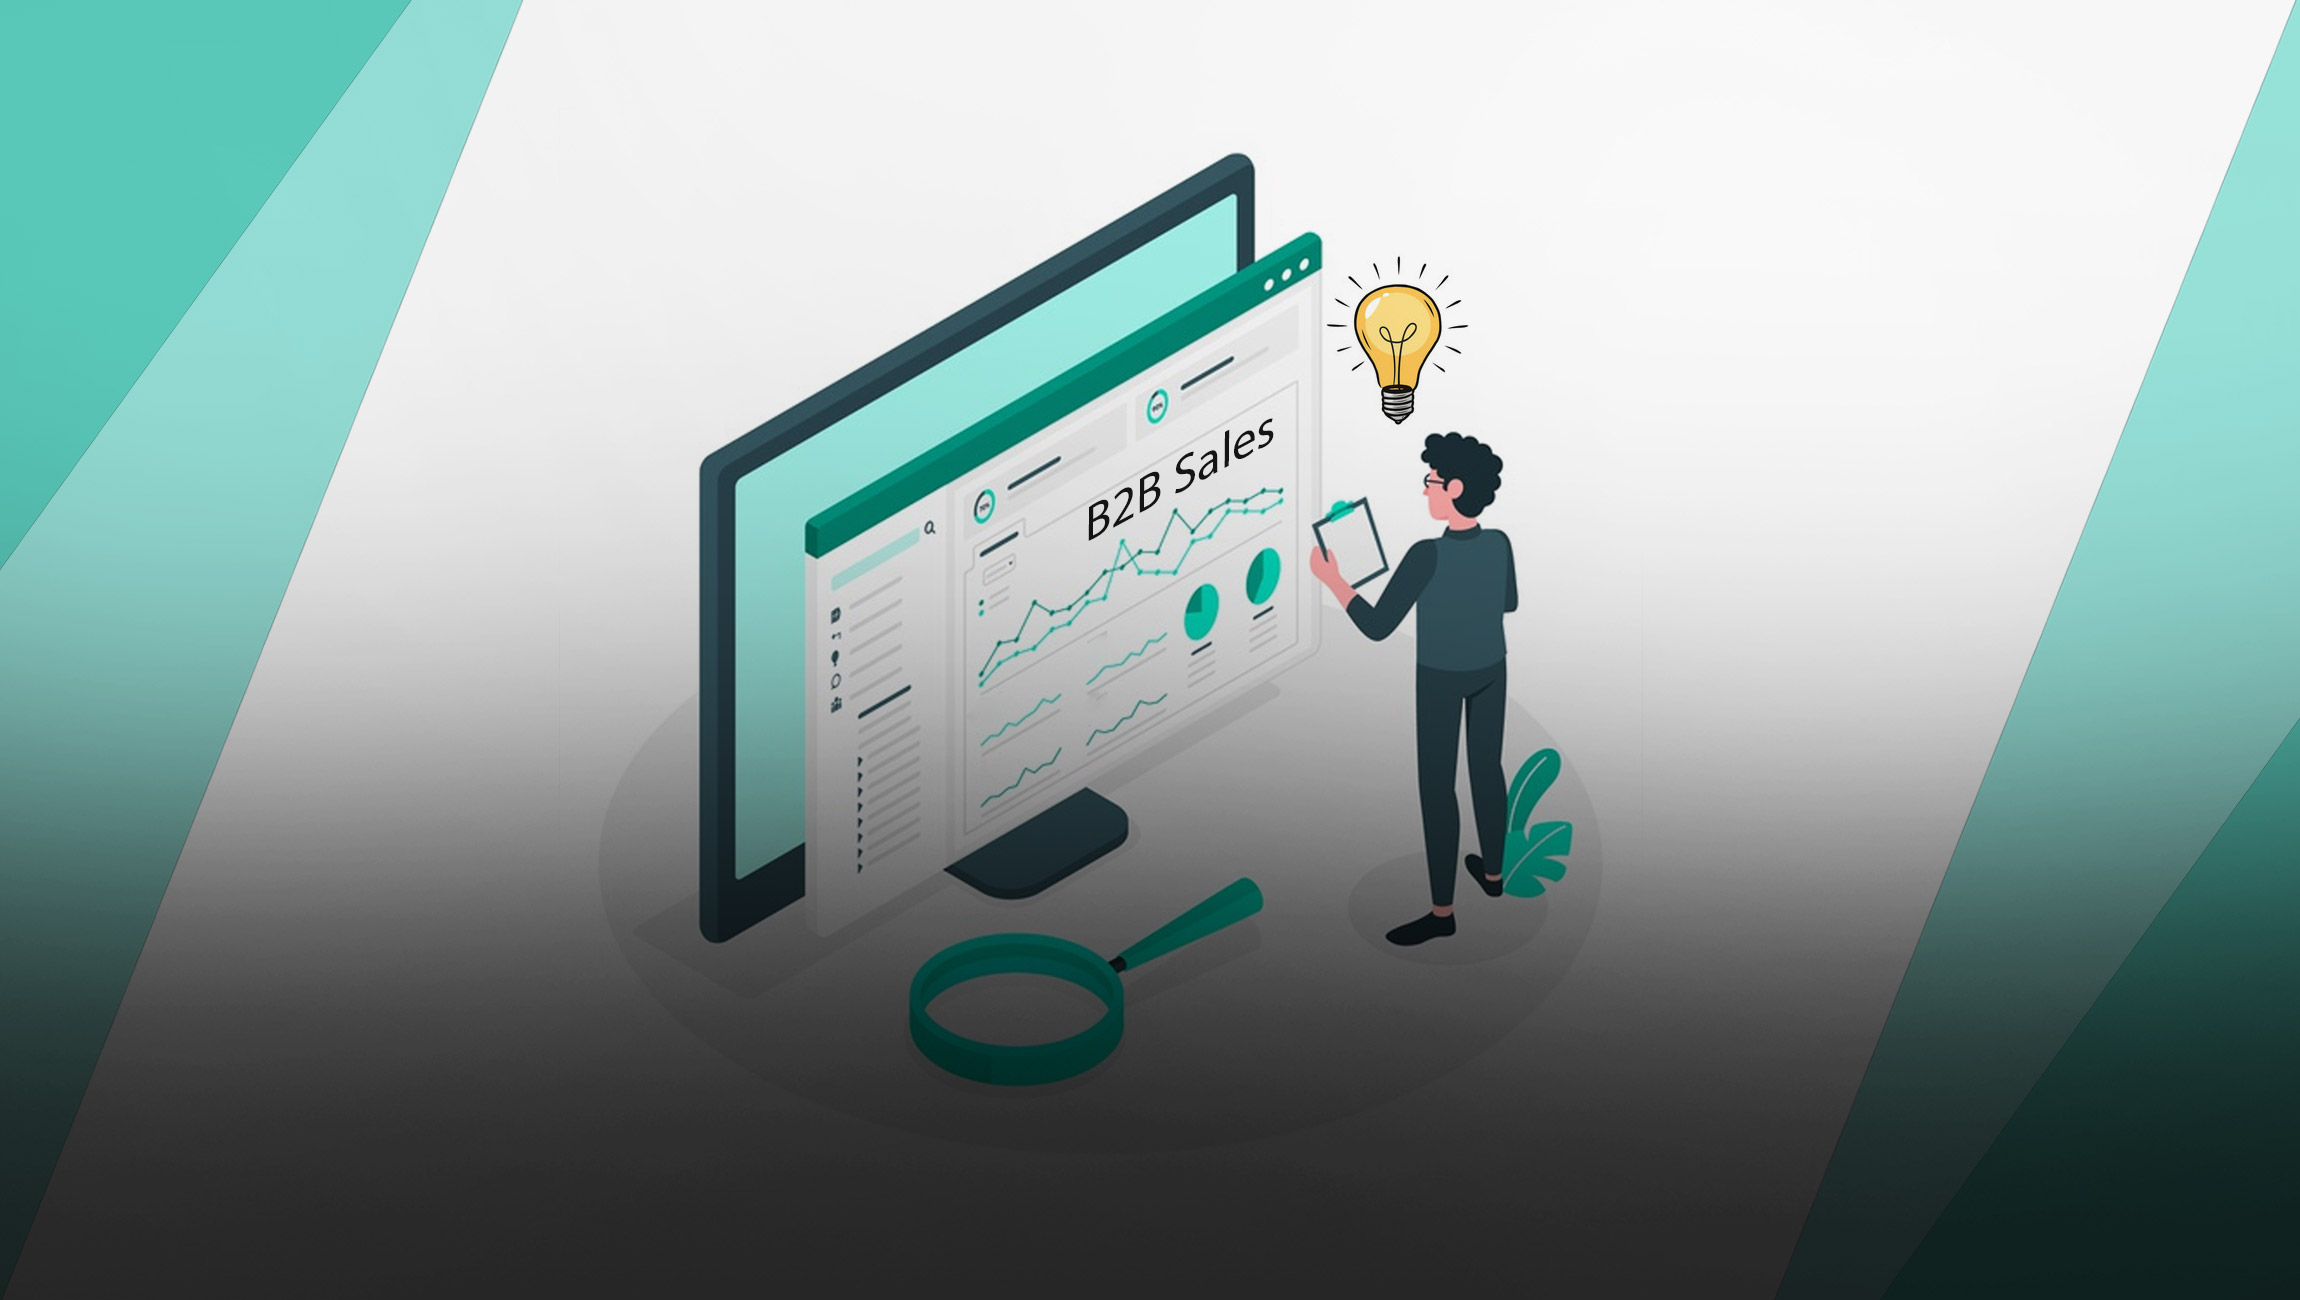 Price Optimization in B2B Sales: Quick Tips